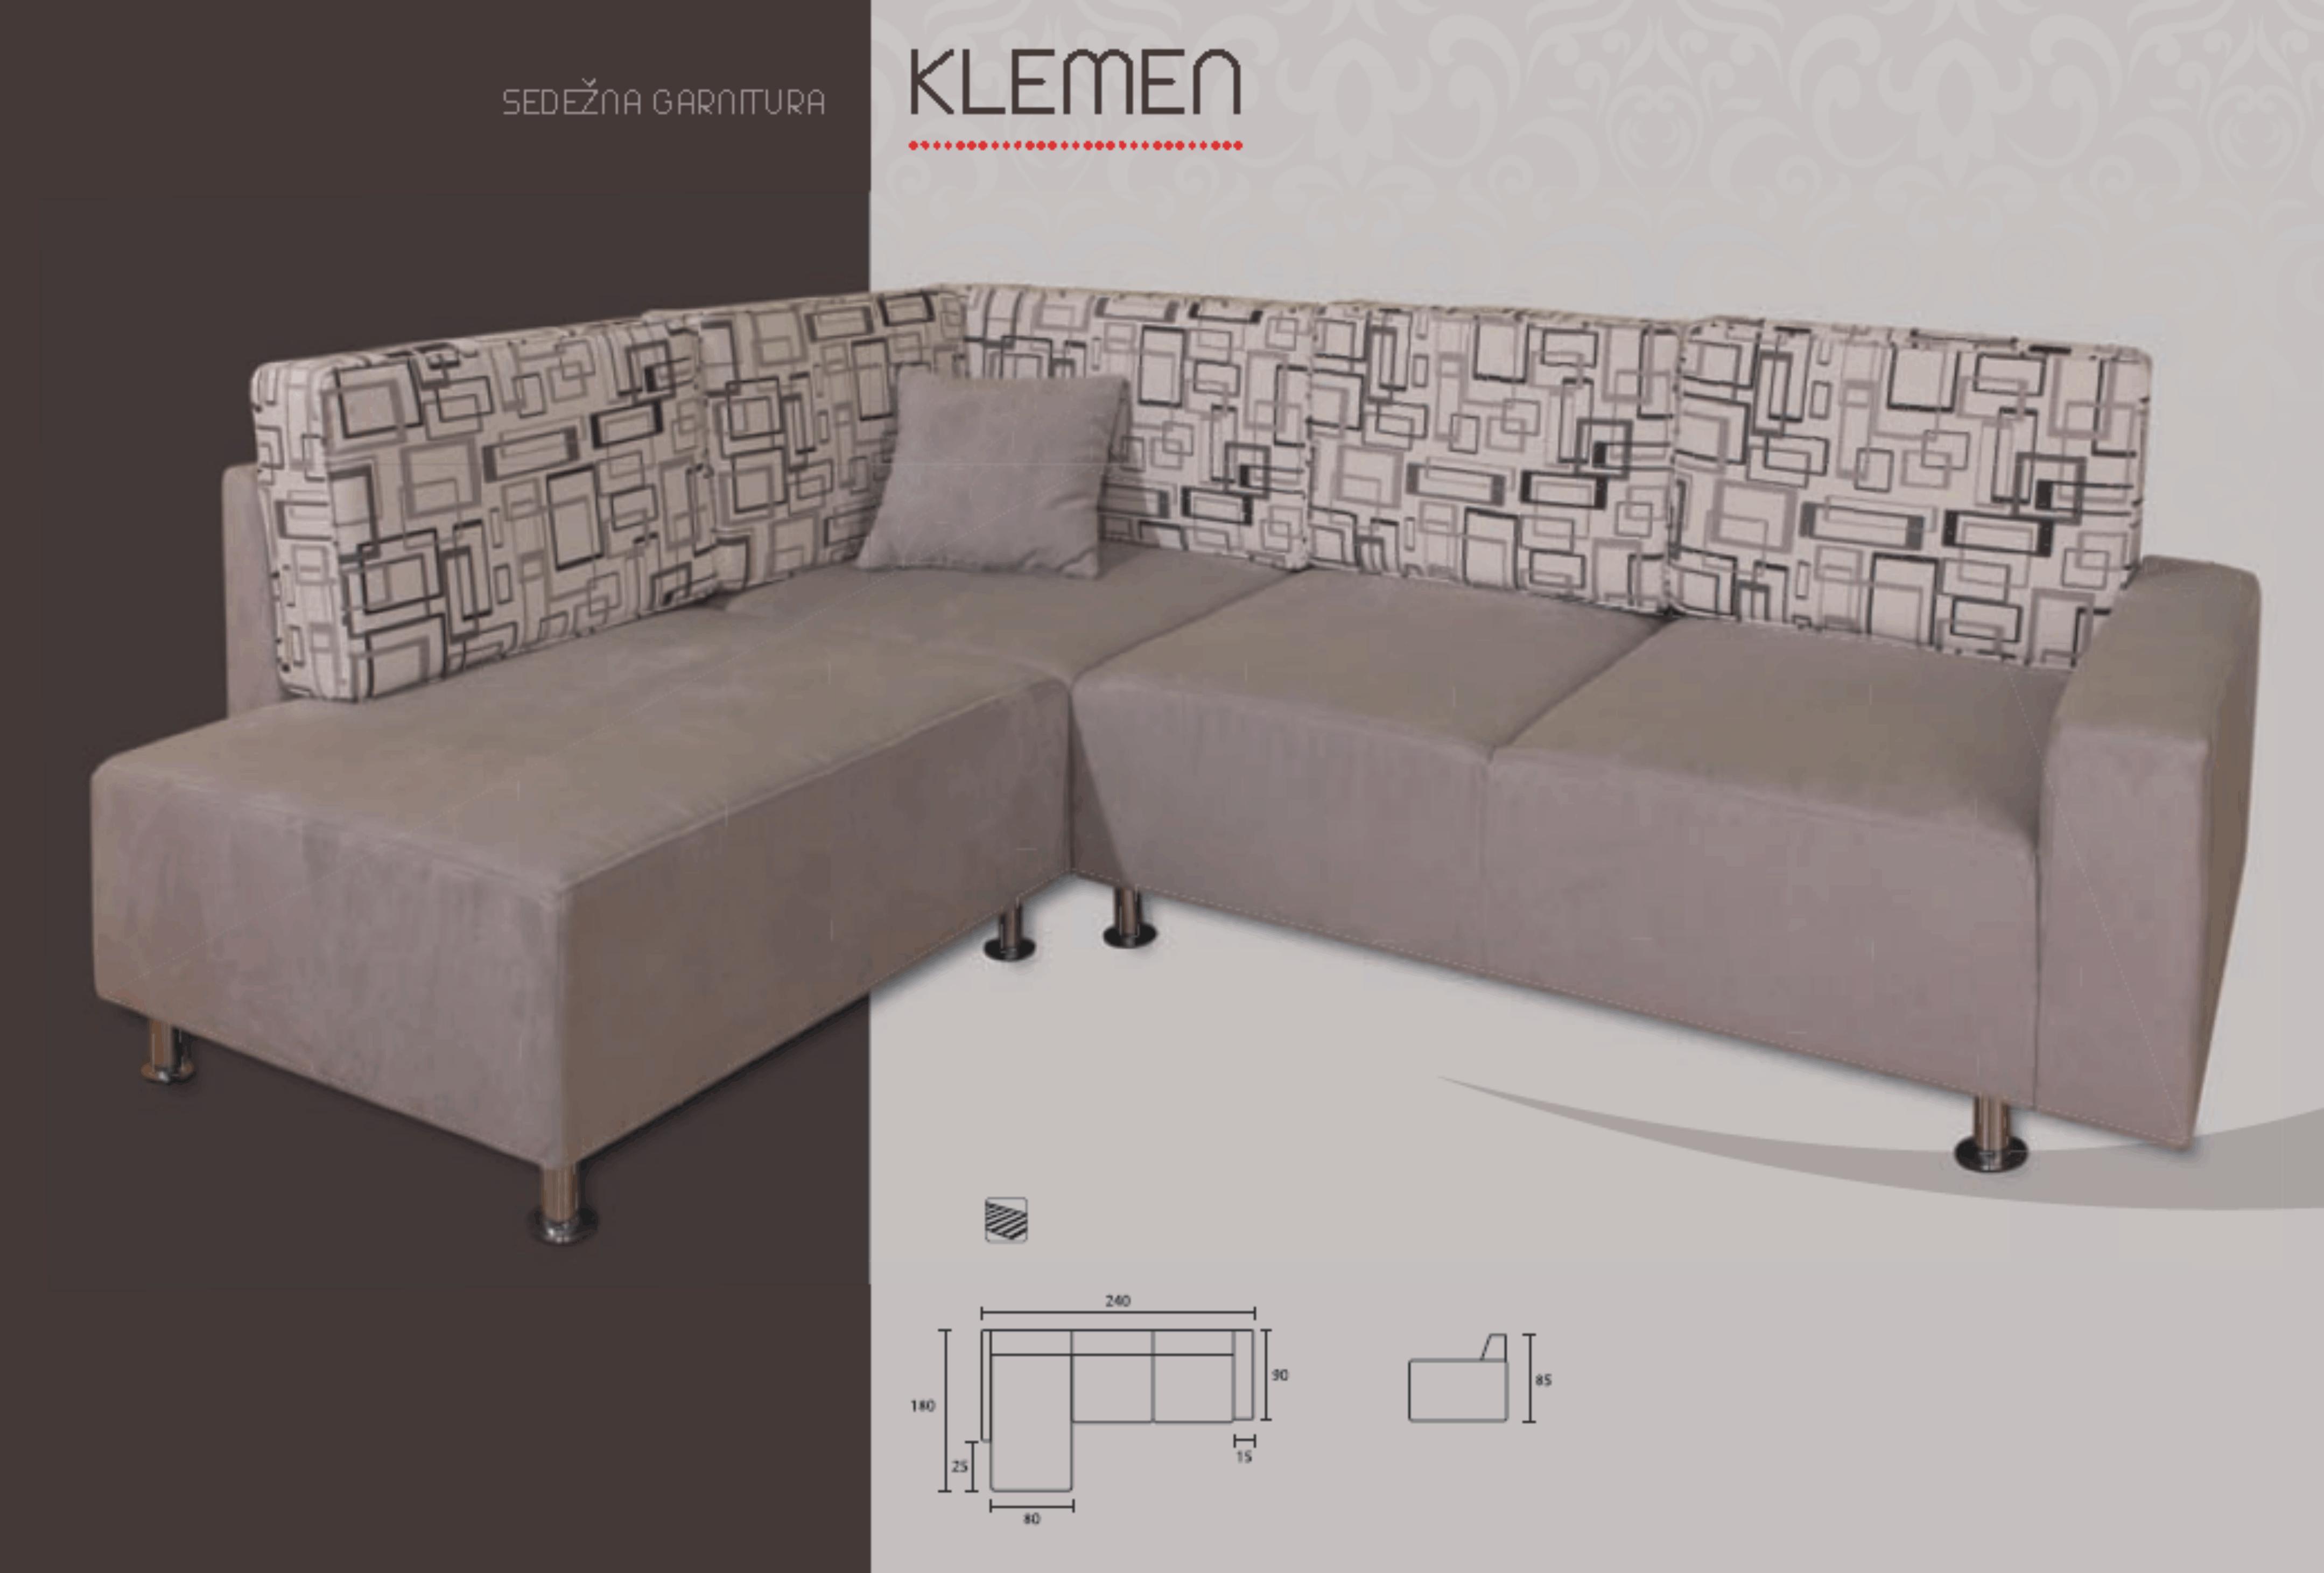 klemen_sedezna